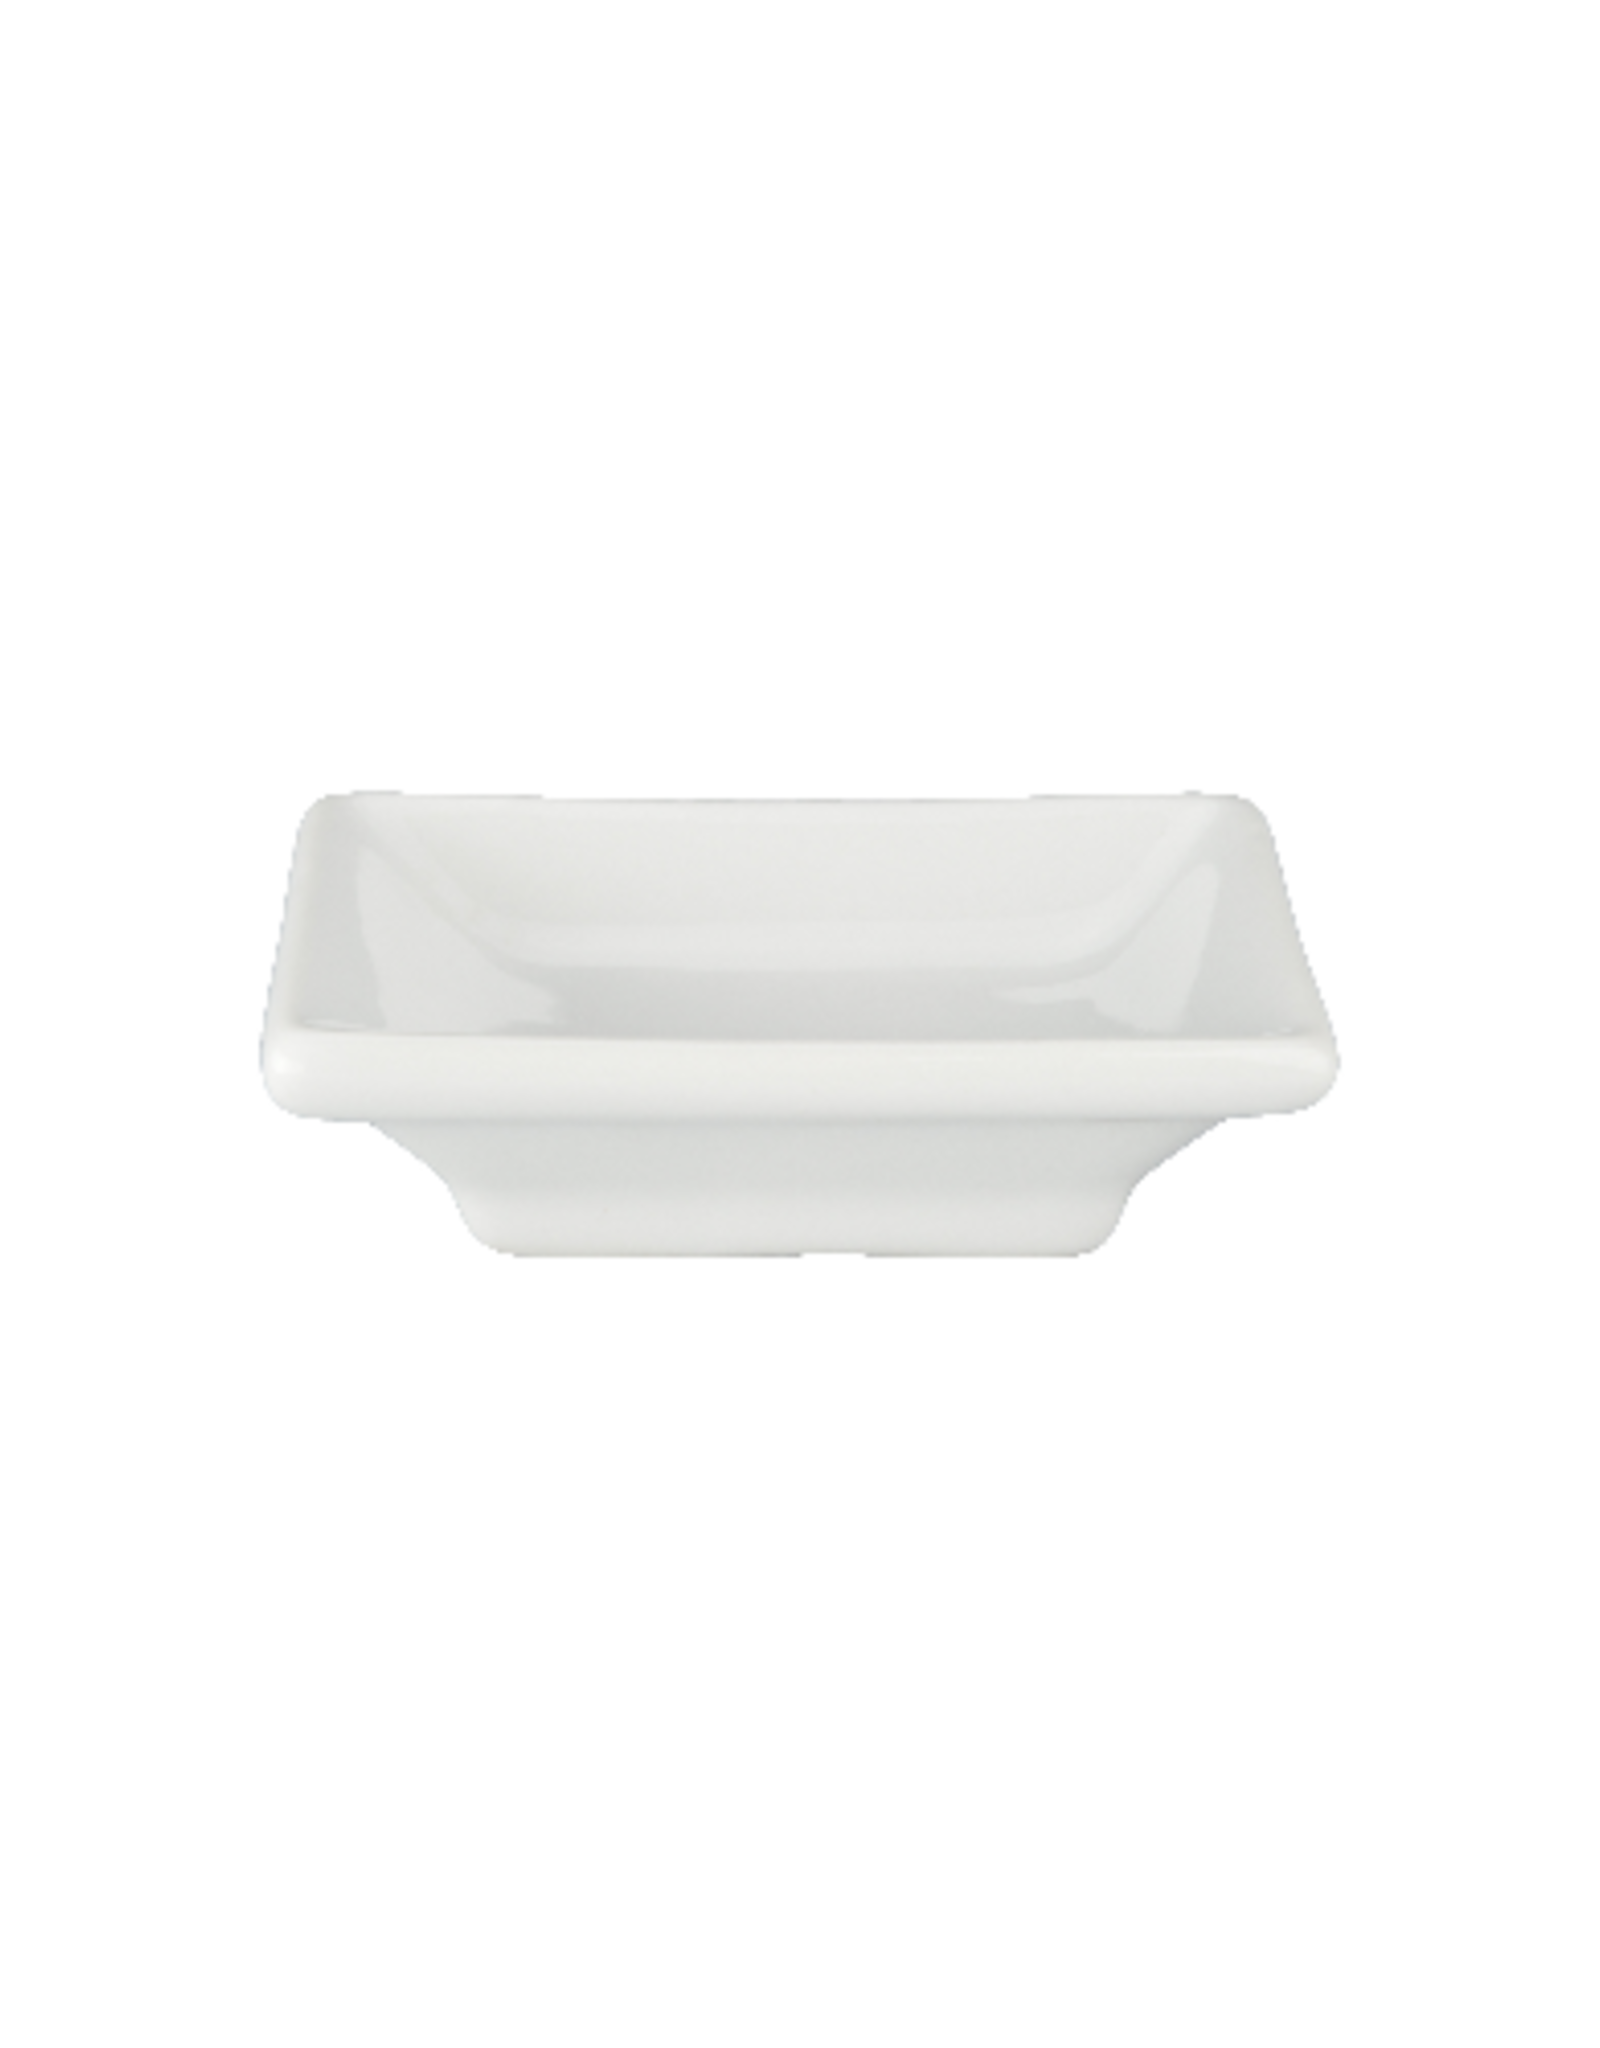 BIA Cordon Bleu Rectangular Soy Dish 1 oz